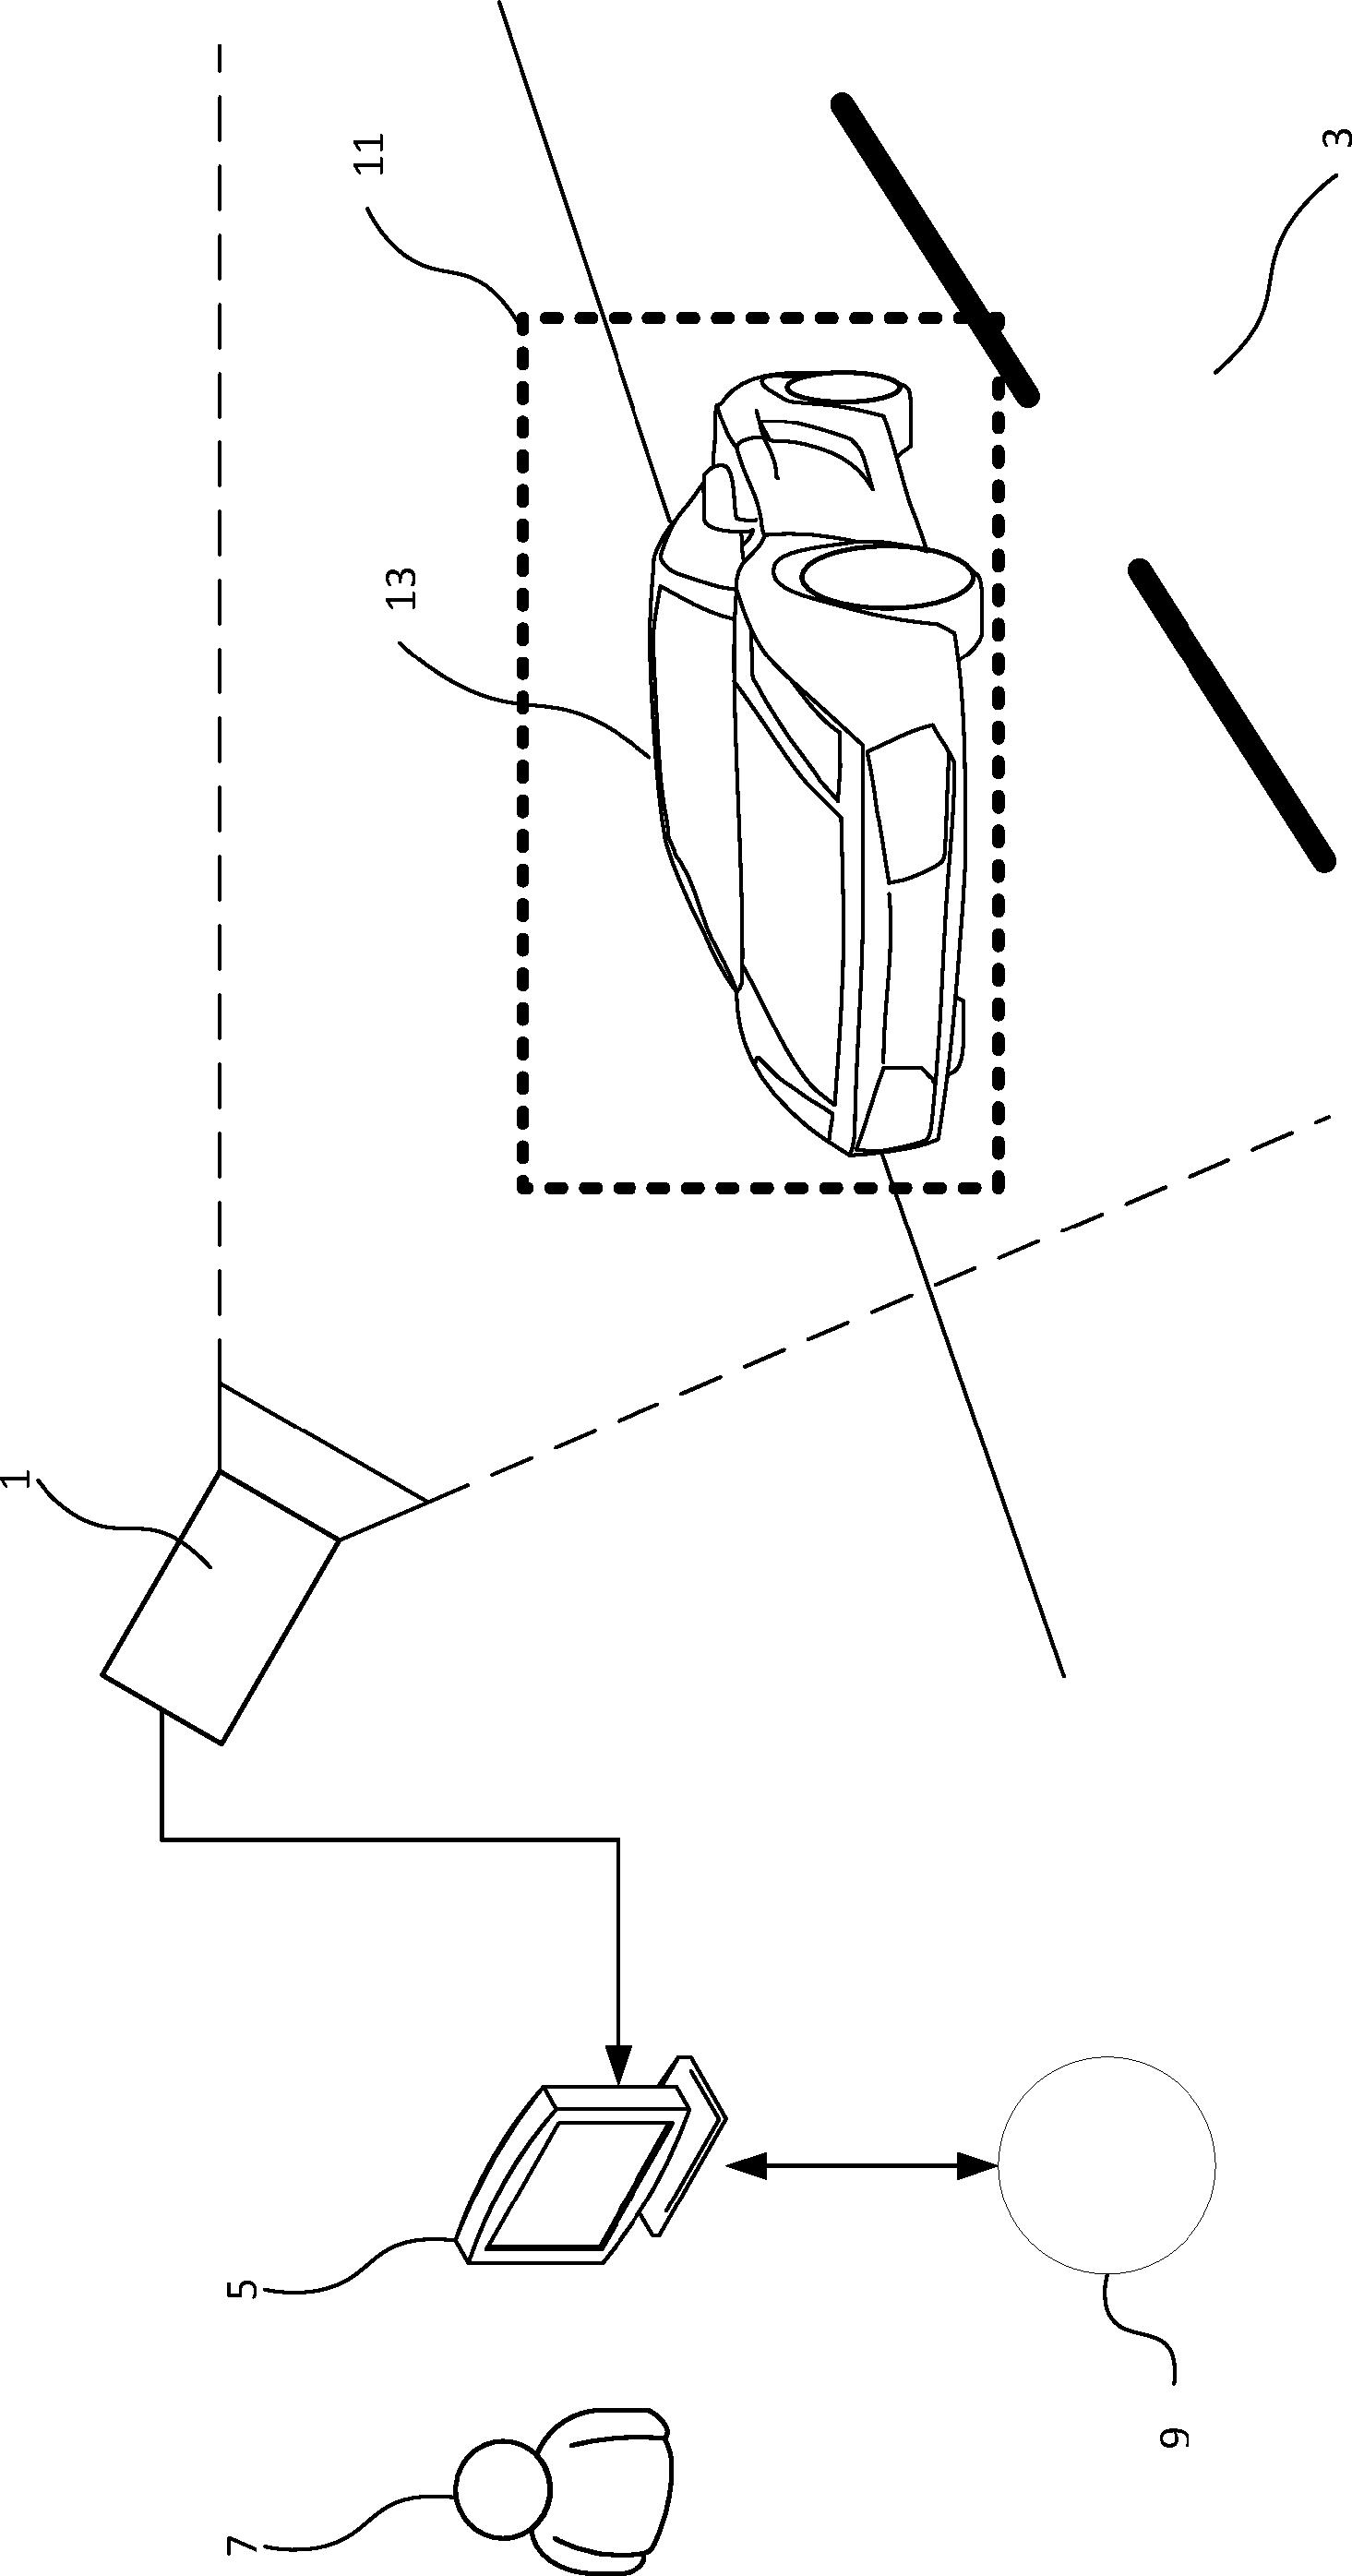 Figure GB2554948A_D0002